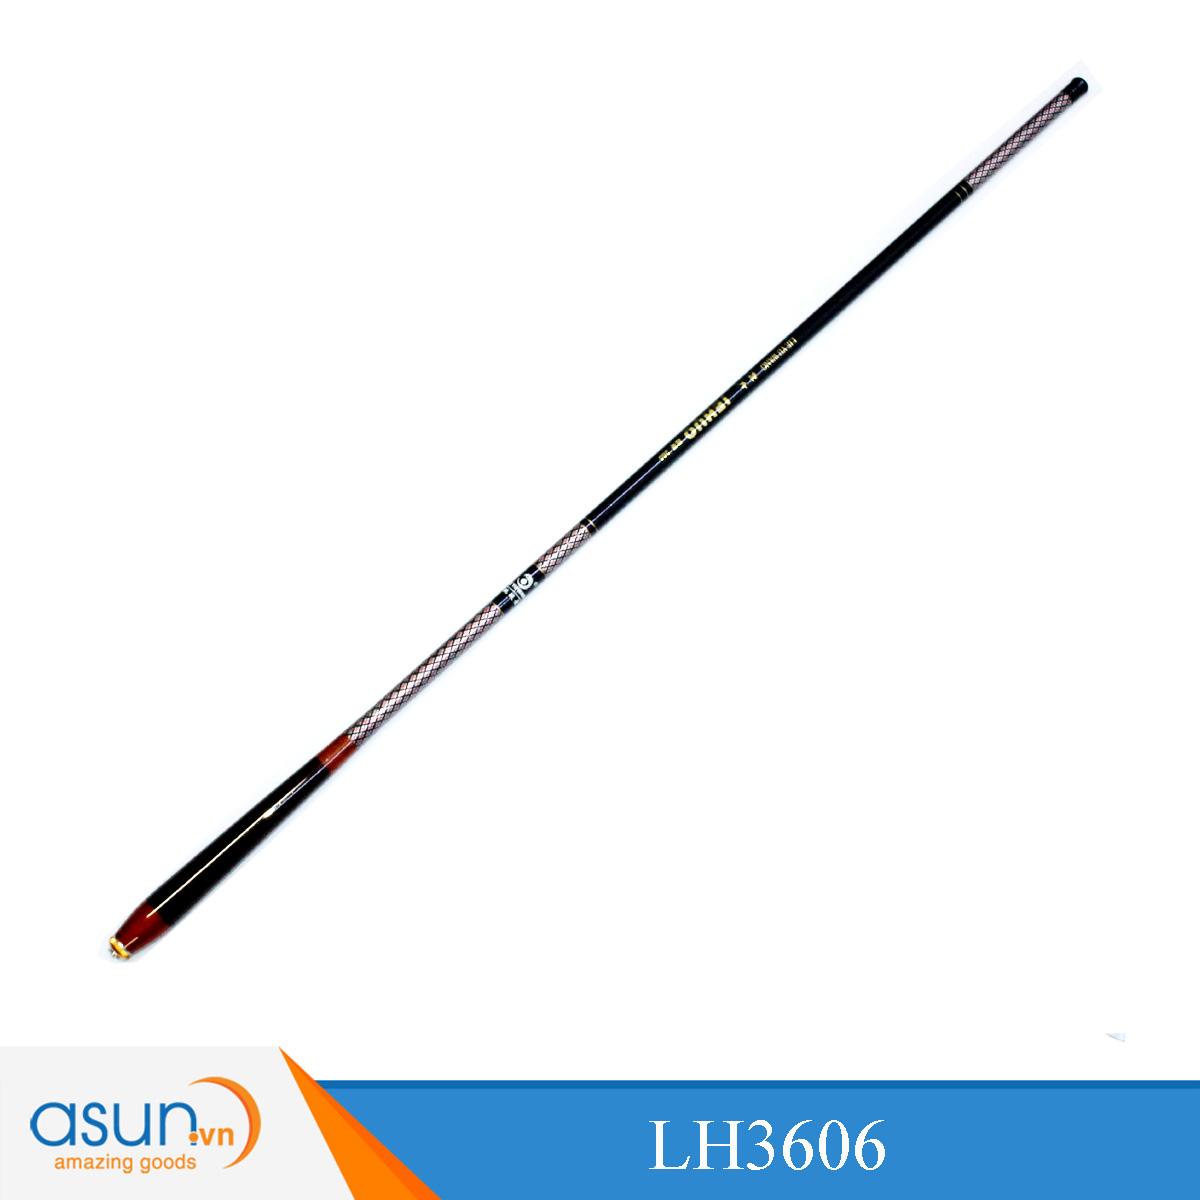 Cần Câu Tay Lei Yu Wang LeiHuo 3606 - 3m6 Cần câu chính hãng